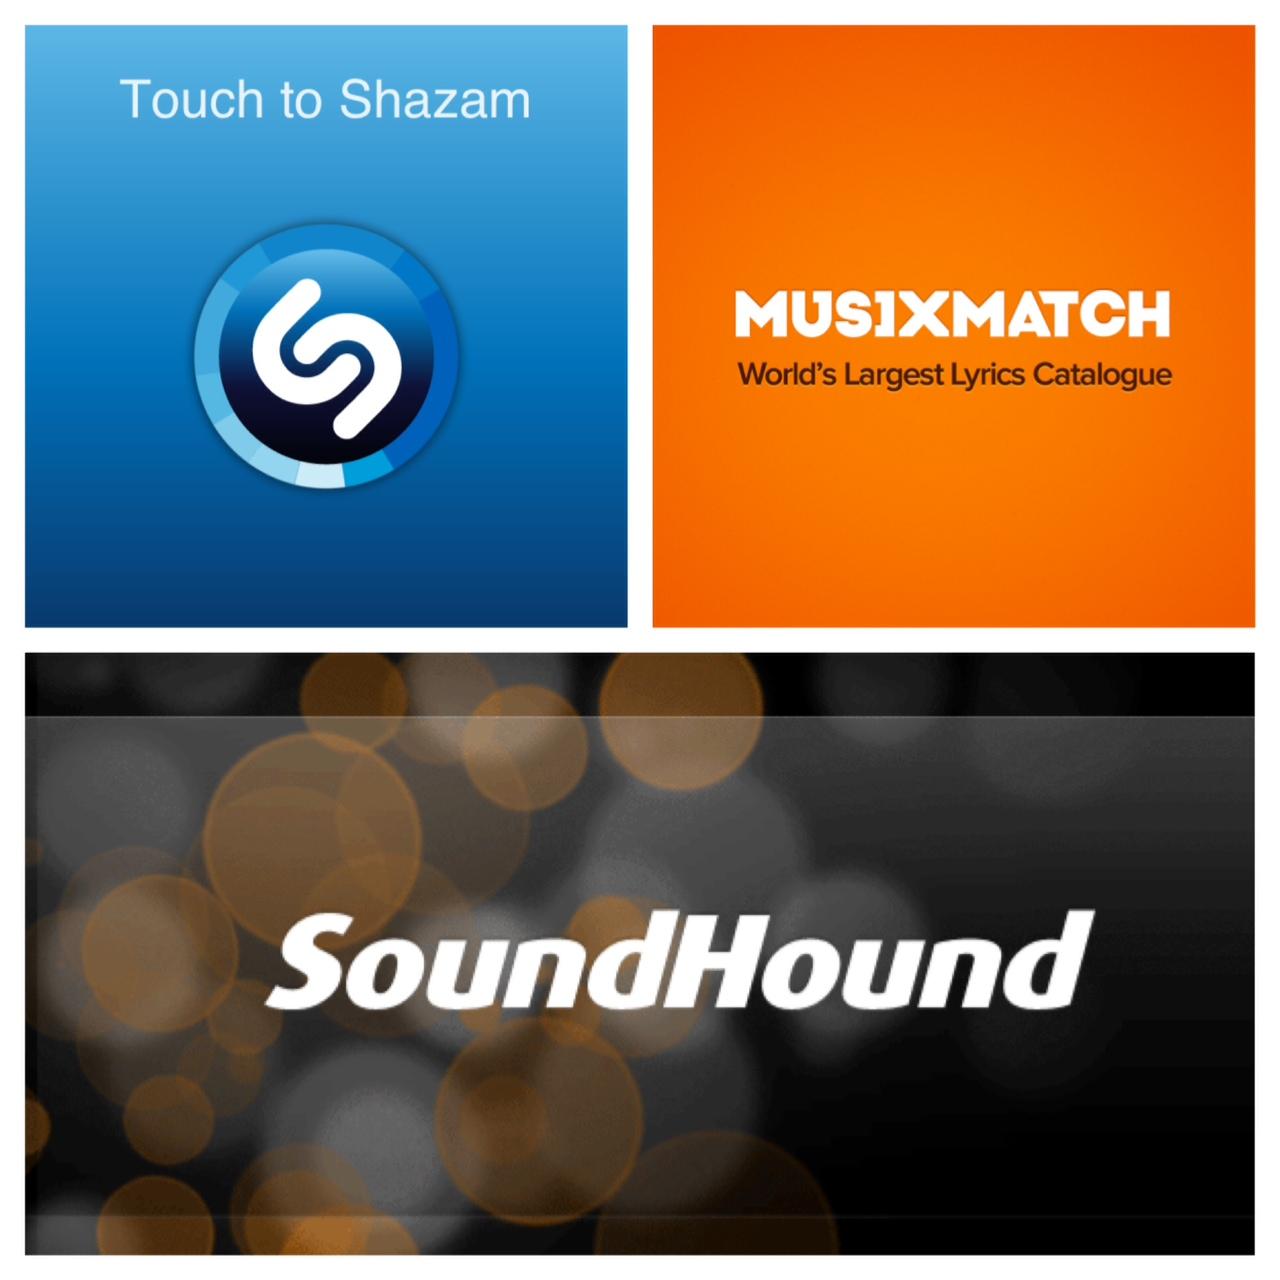 Shazam Vs Another Music Identifying Applications